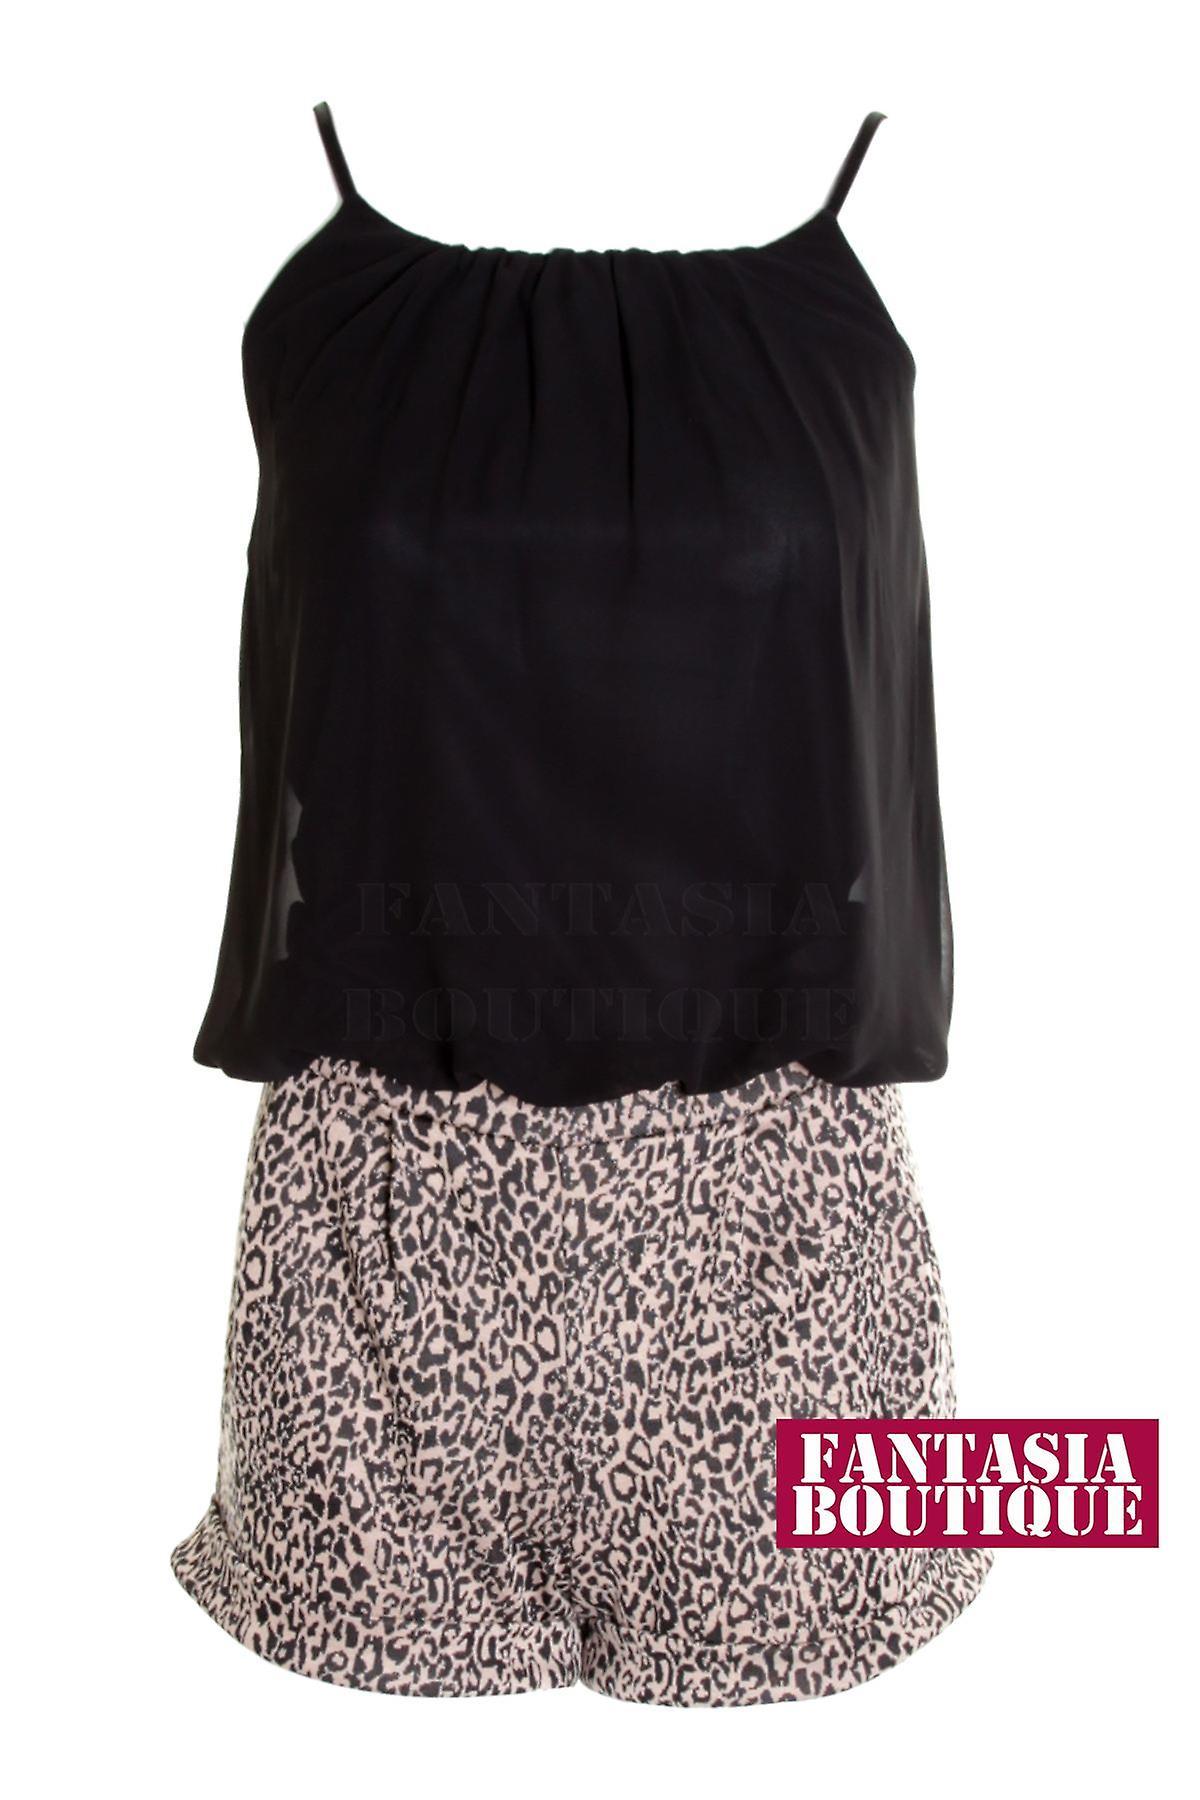 5bbd19648f620 Ladies Zig Zag Leopard Sleeveless Chiffon Tie Back Women s Playsuit ...